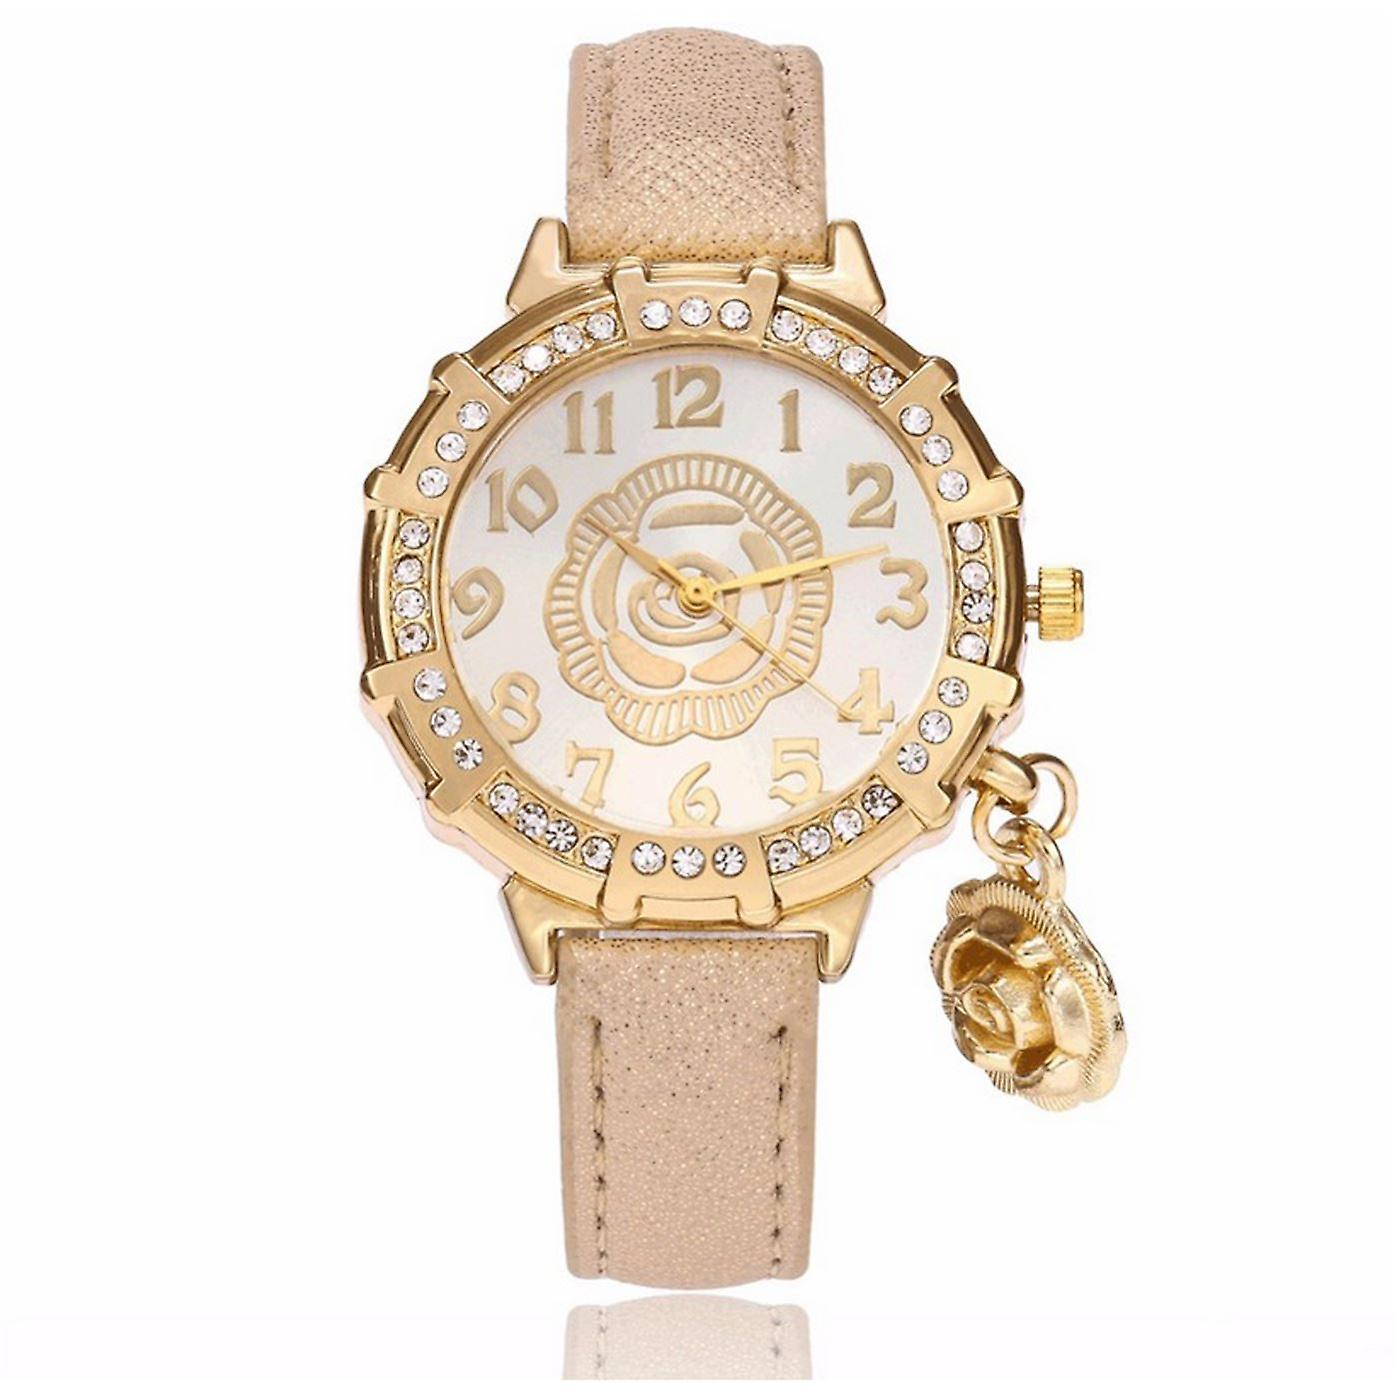 Classy Yellow Gold Flower Watch Luxury Stones Elegant Time GOLD